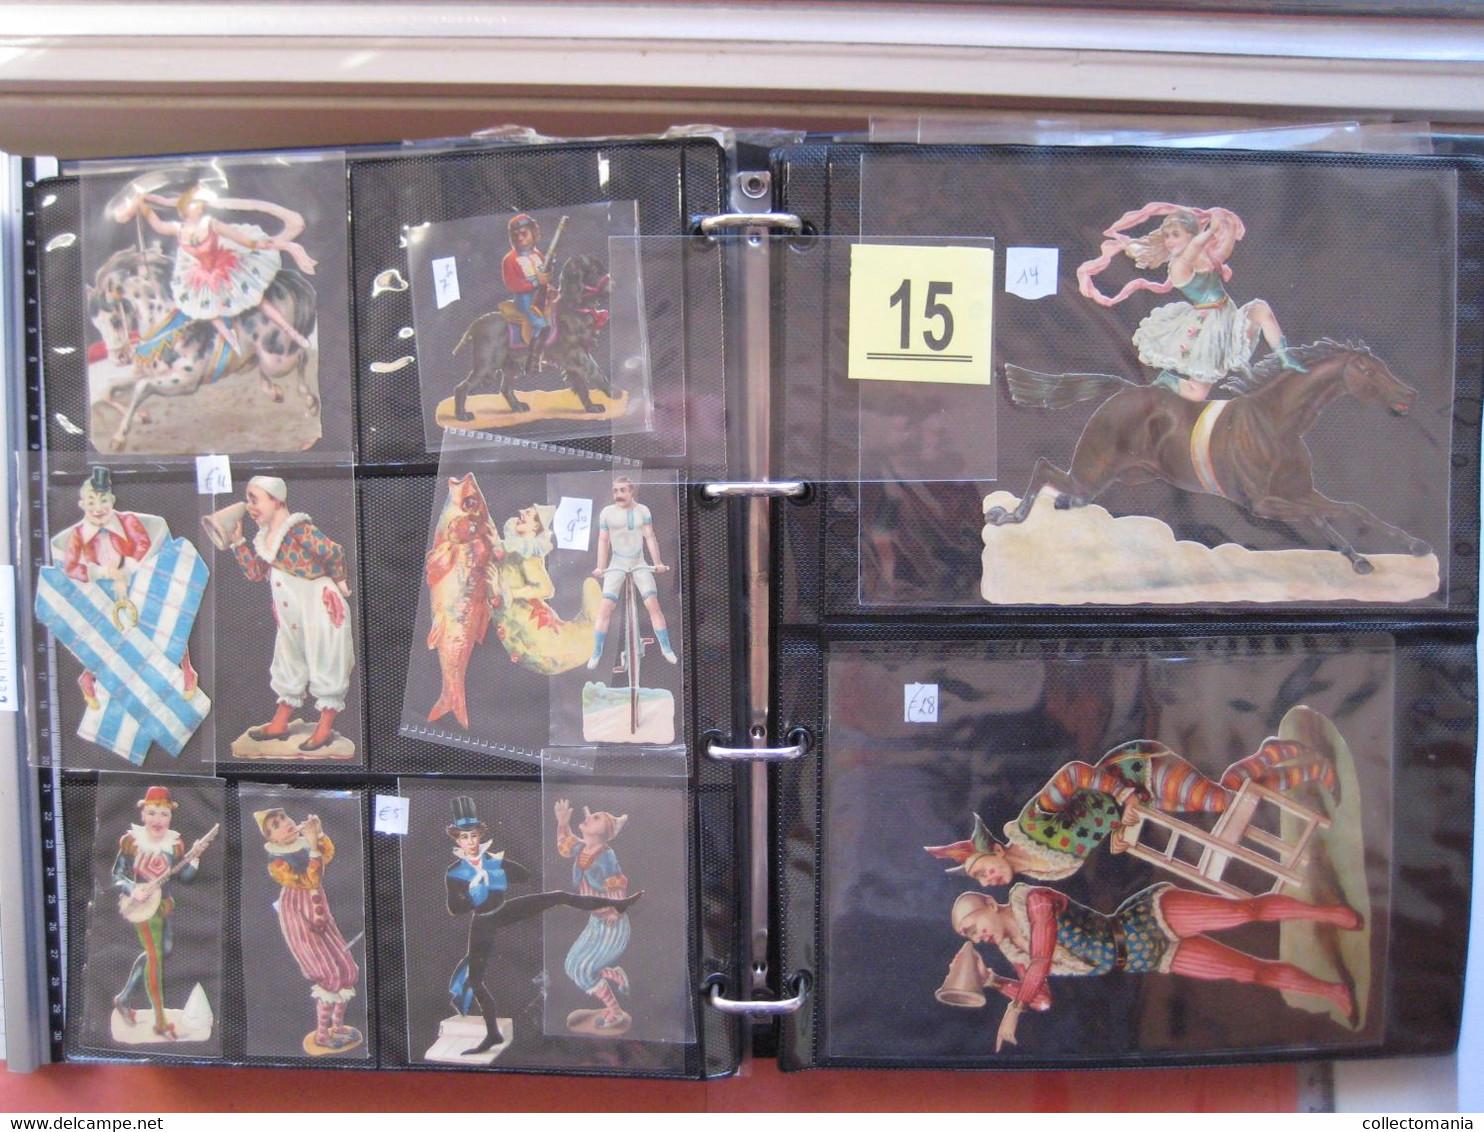 19th Century Each Chromo Photograped (count Yourself ) SCRAPS_MAP12_Cirkus Circus Clowns GLANS BILDER VG Collection - Animals